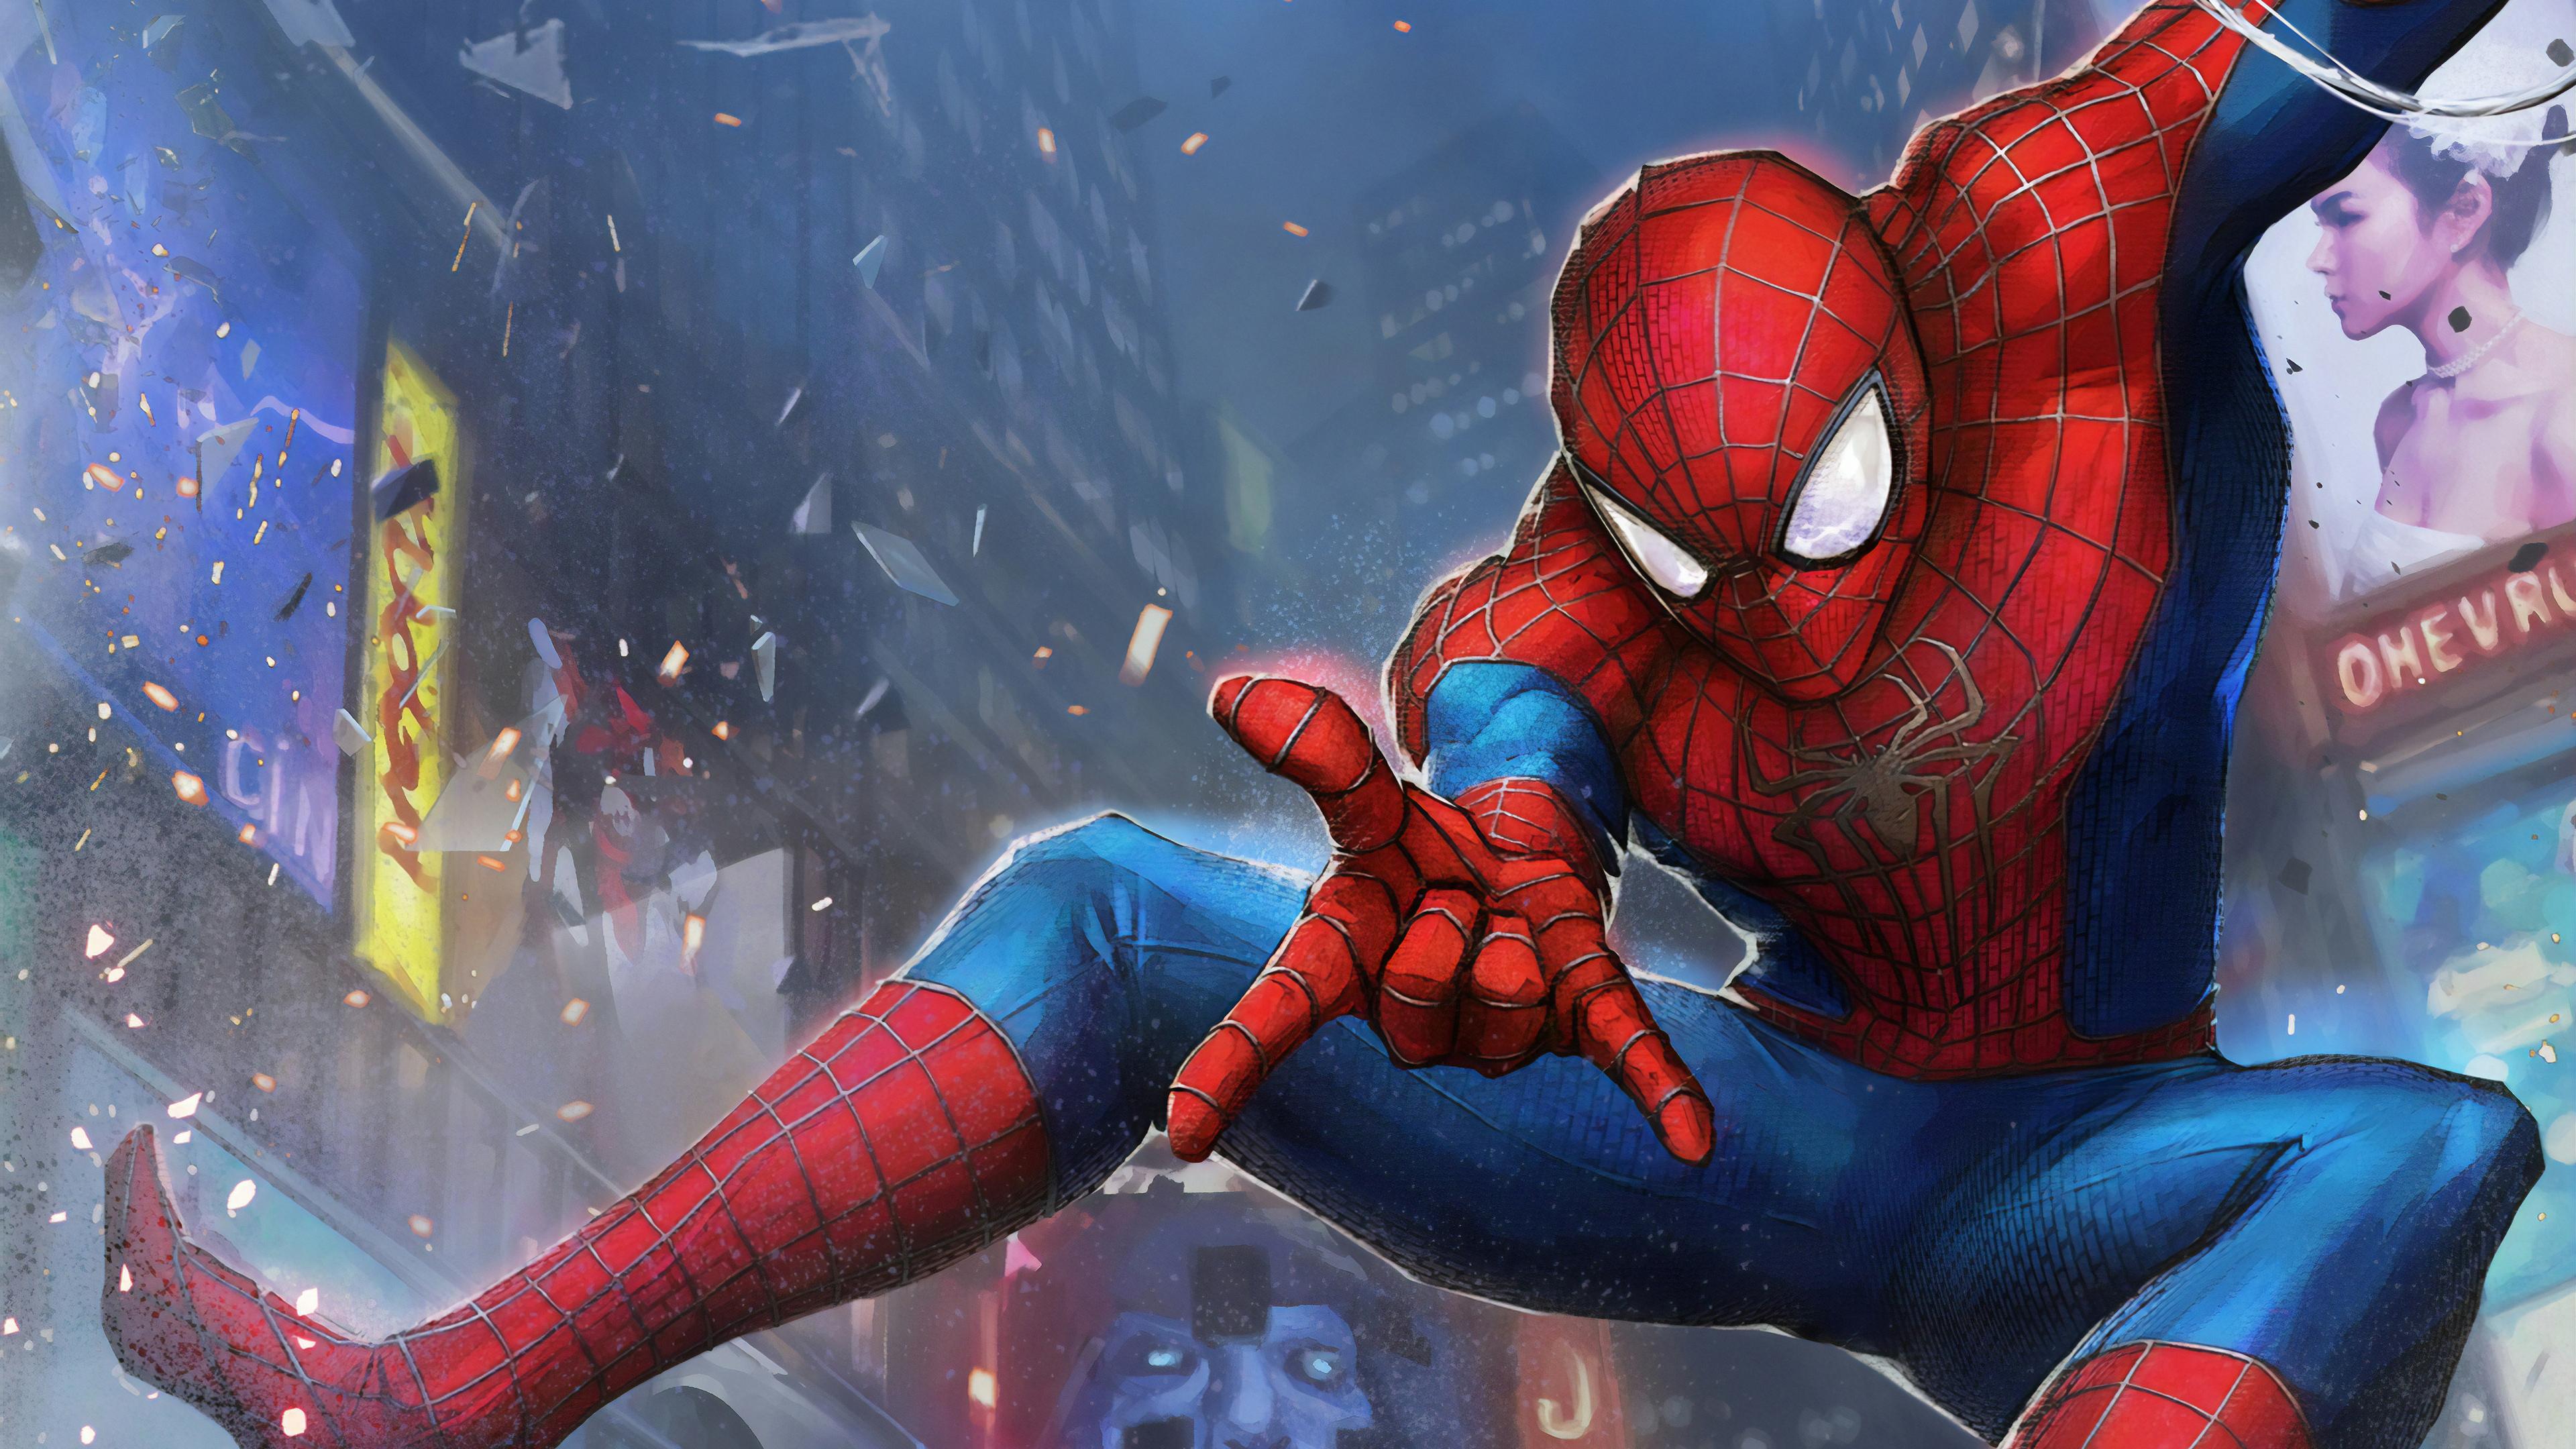 spiderman art 1570393996 - Spiderman art - superheroes wallpapers, spiderman wallpapers, hd-wallpapers, digital art wallpapers, artwork wallpapers, artstation wallpapers, art wallpapers, 4k-wallpapers